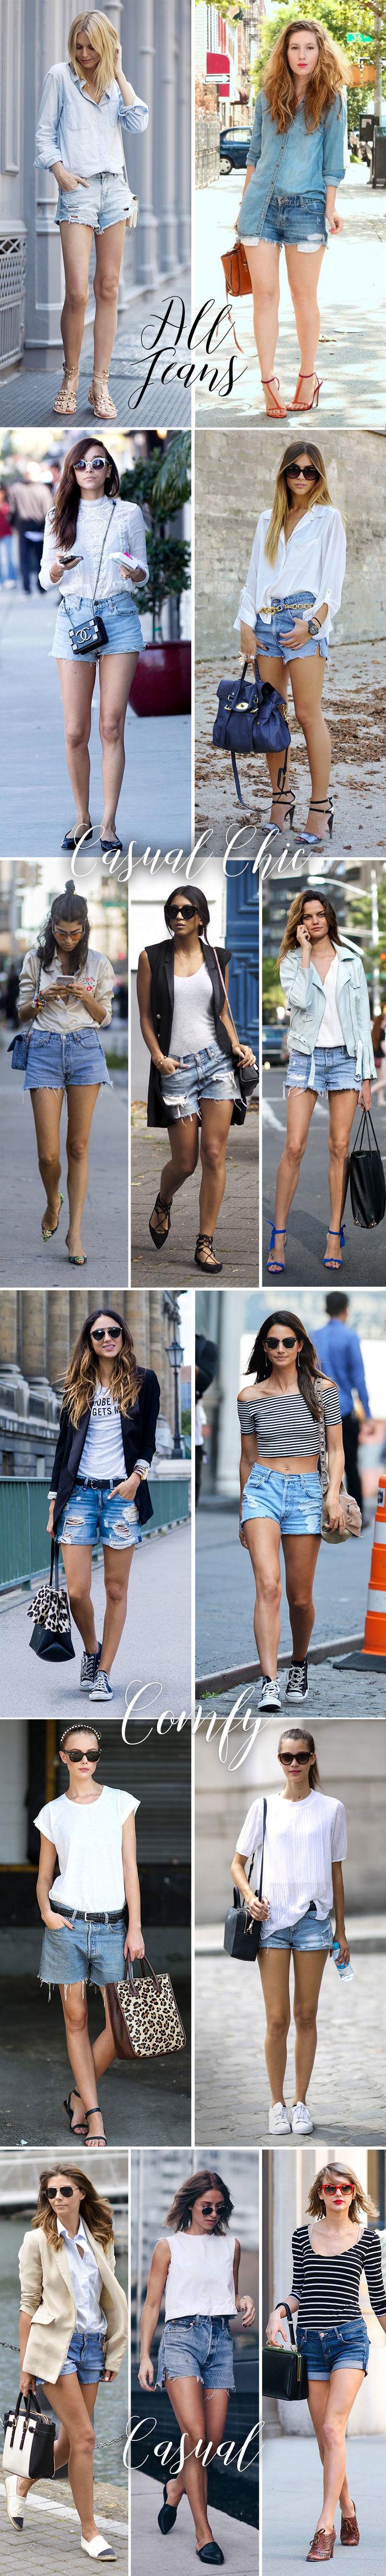 Como usar short jeans - Por Layla Monteiro